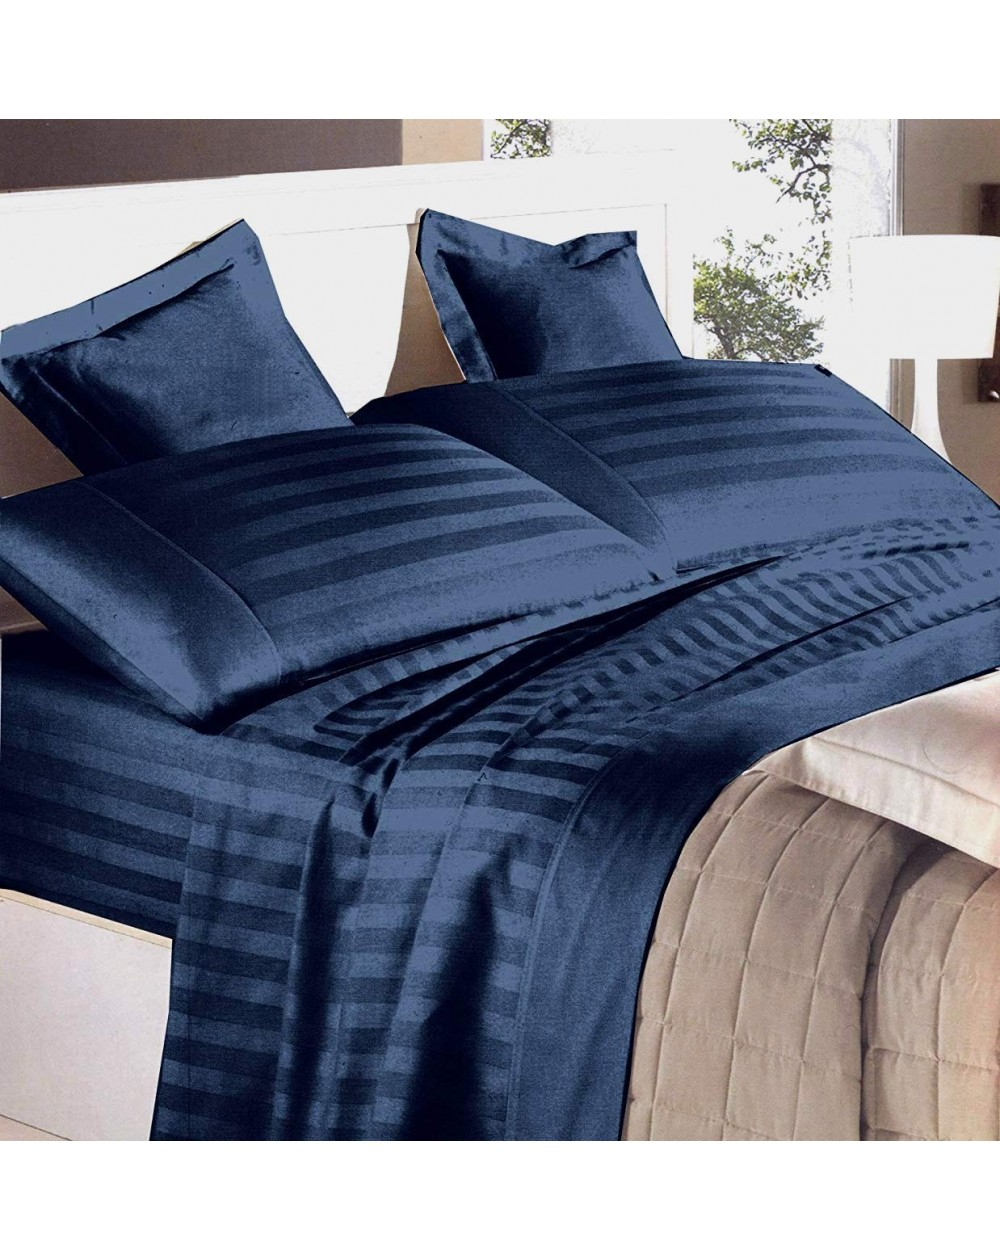 Lenzuola Di Raso Matrimoniali.Garnitur Bettlaken Doppelbett Baumwolle Italia Blu Navy